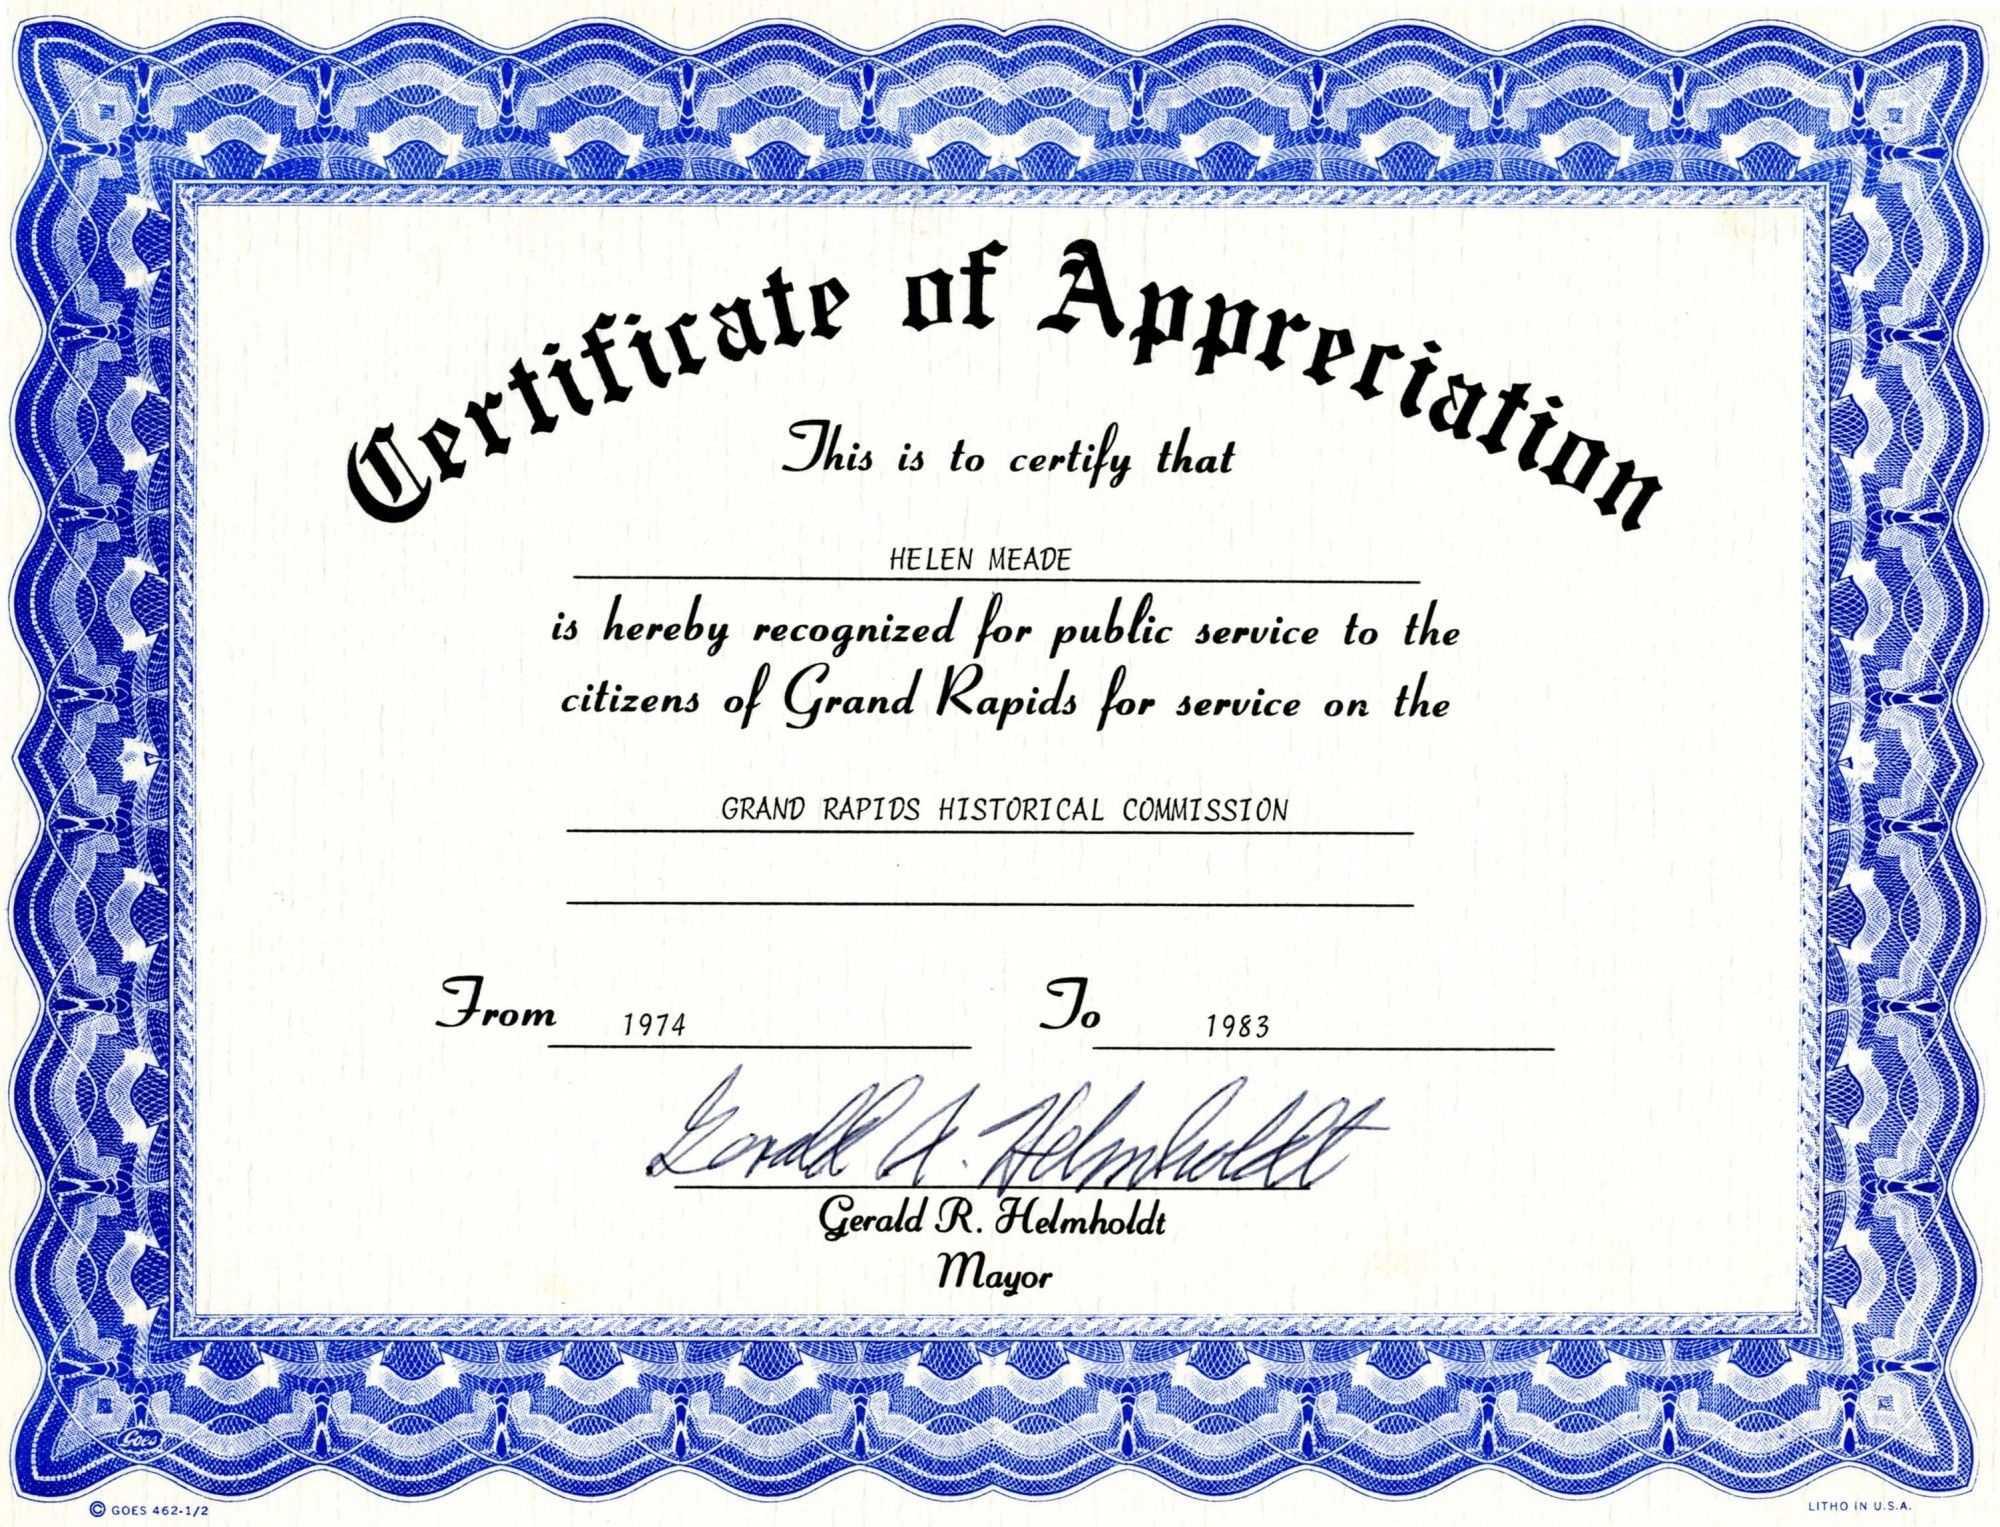 Appreciation Certificate Templates Free Download Regarding Blank Certificate Templates Free Download